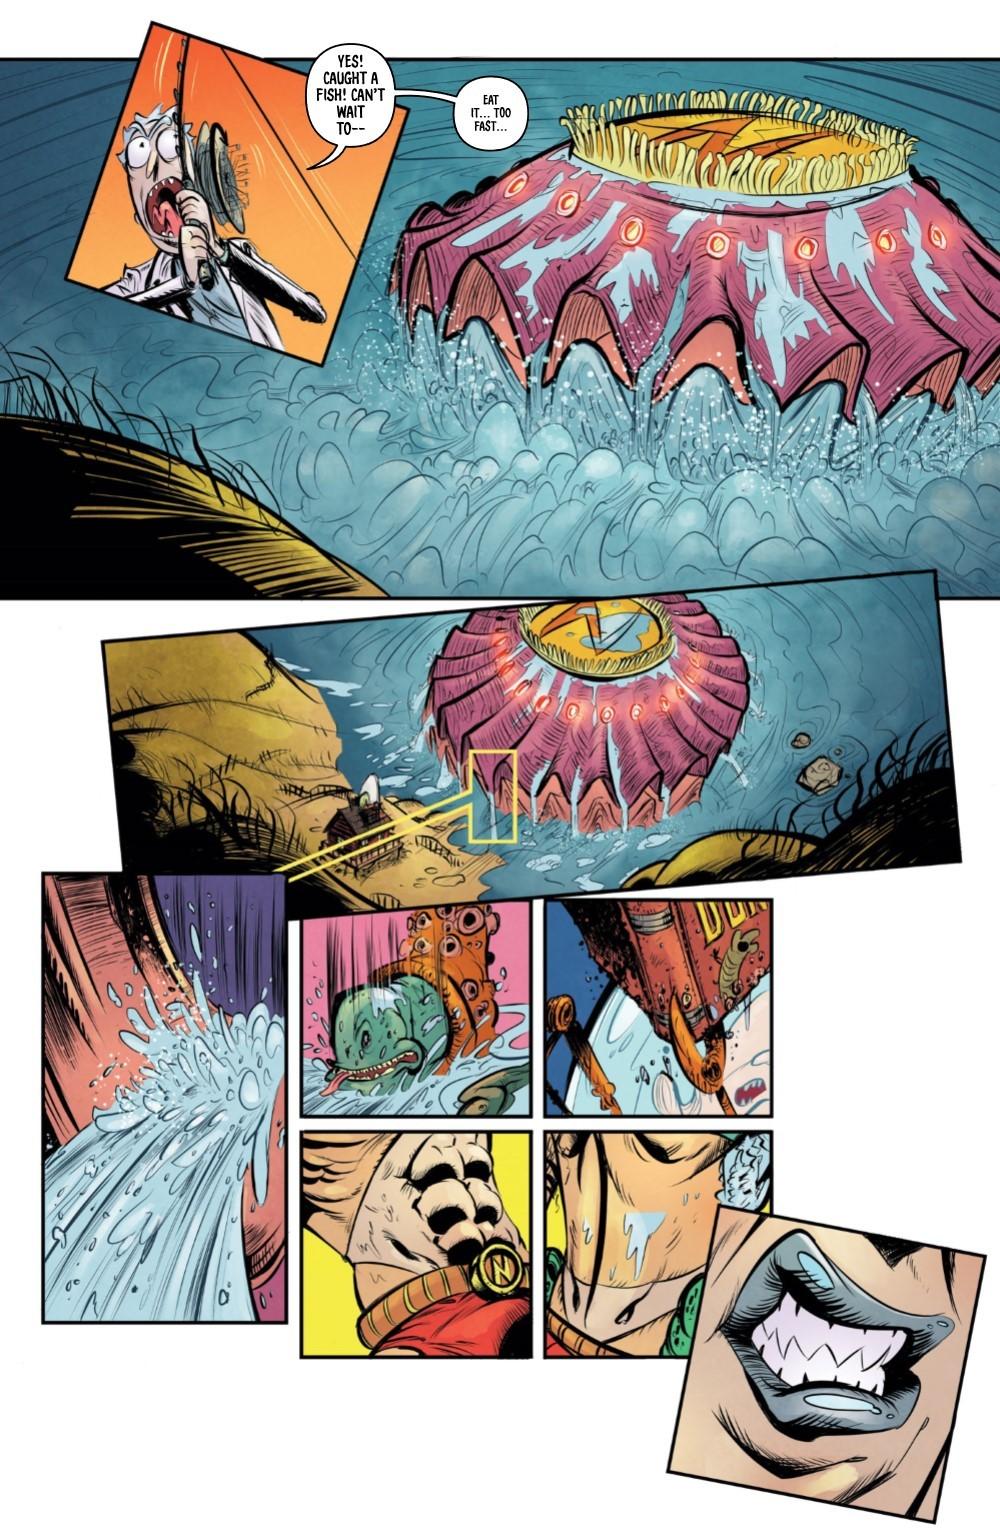 RM-MRNIMBUS-1-REFERENCE-10 ComicList Previews: RICK AND MORTY MR. NIMBUS #1